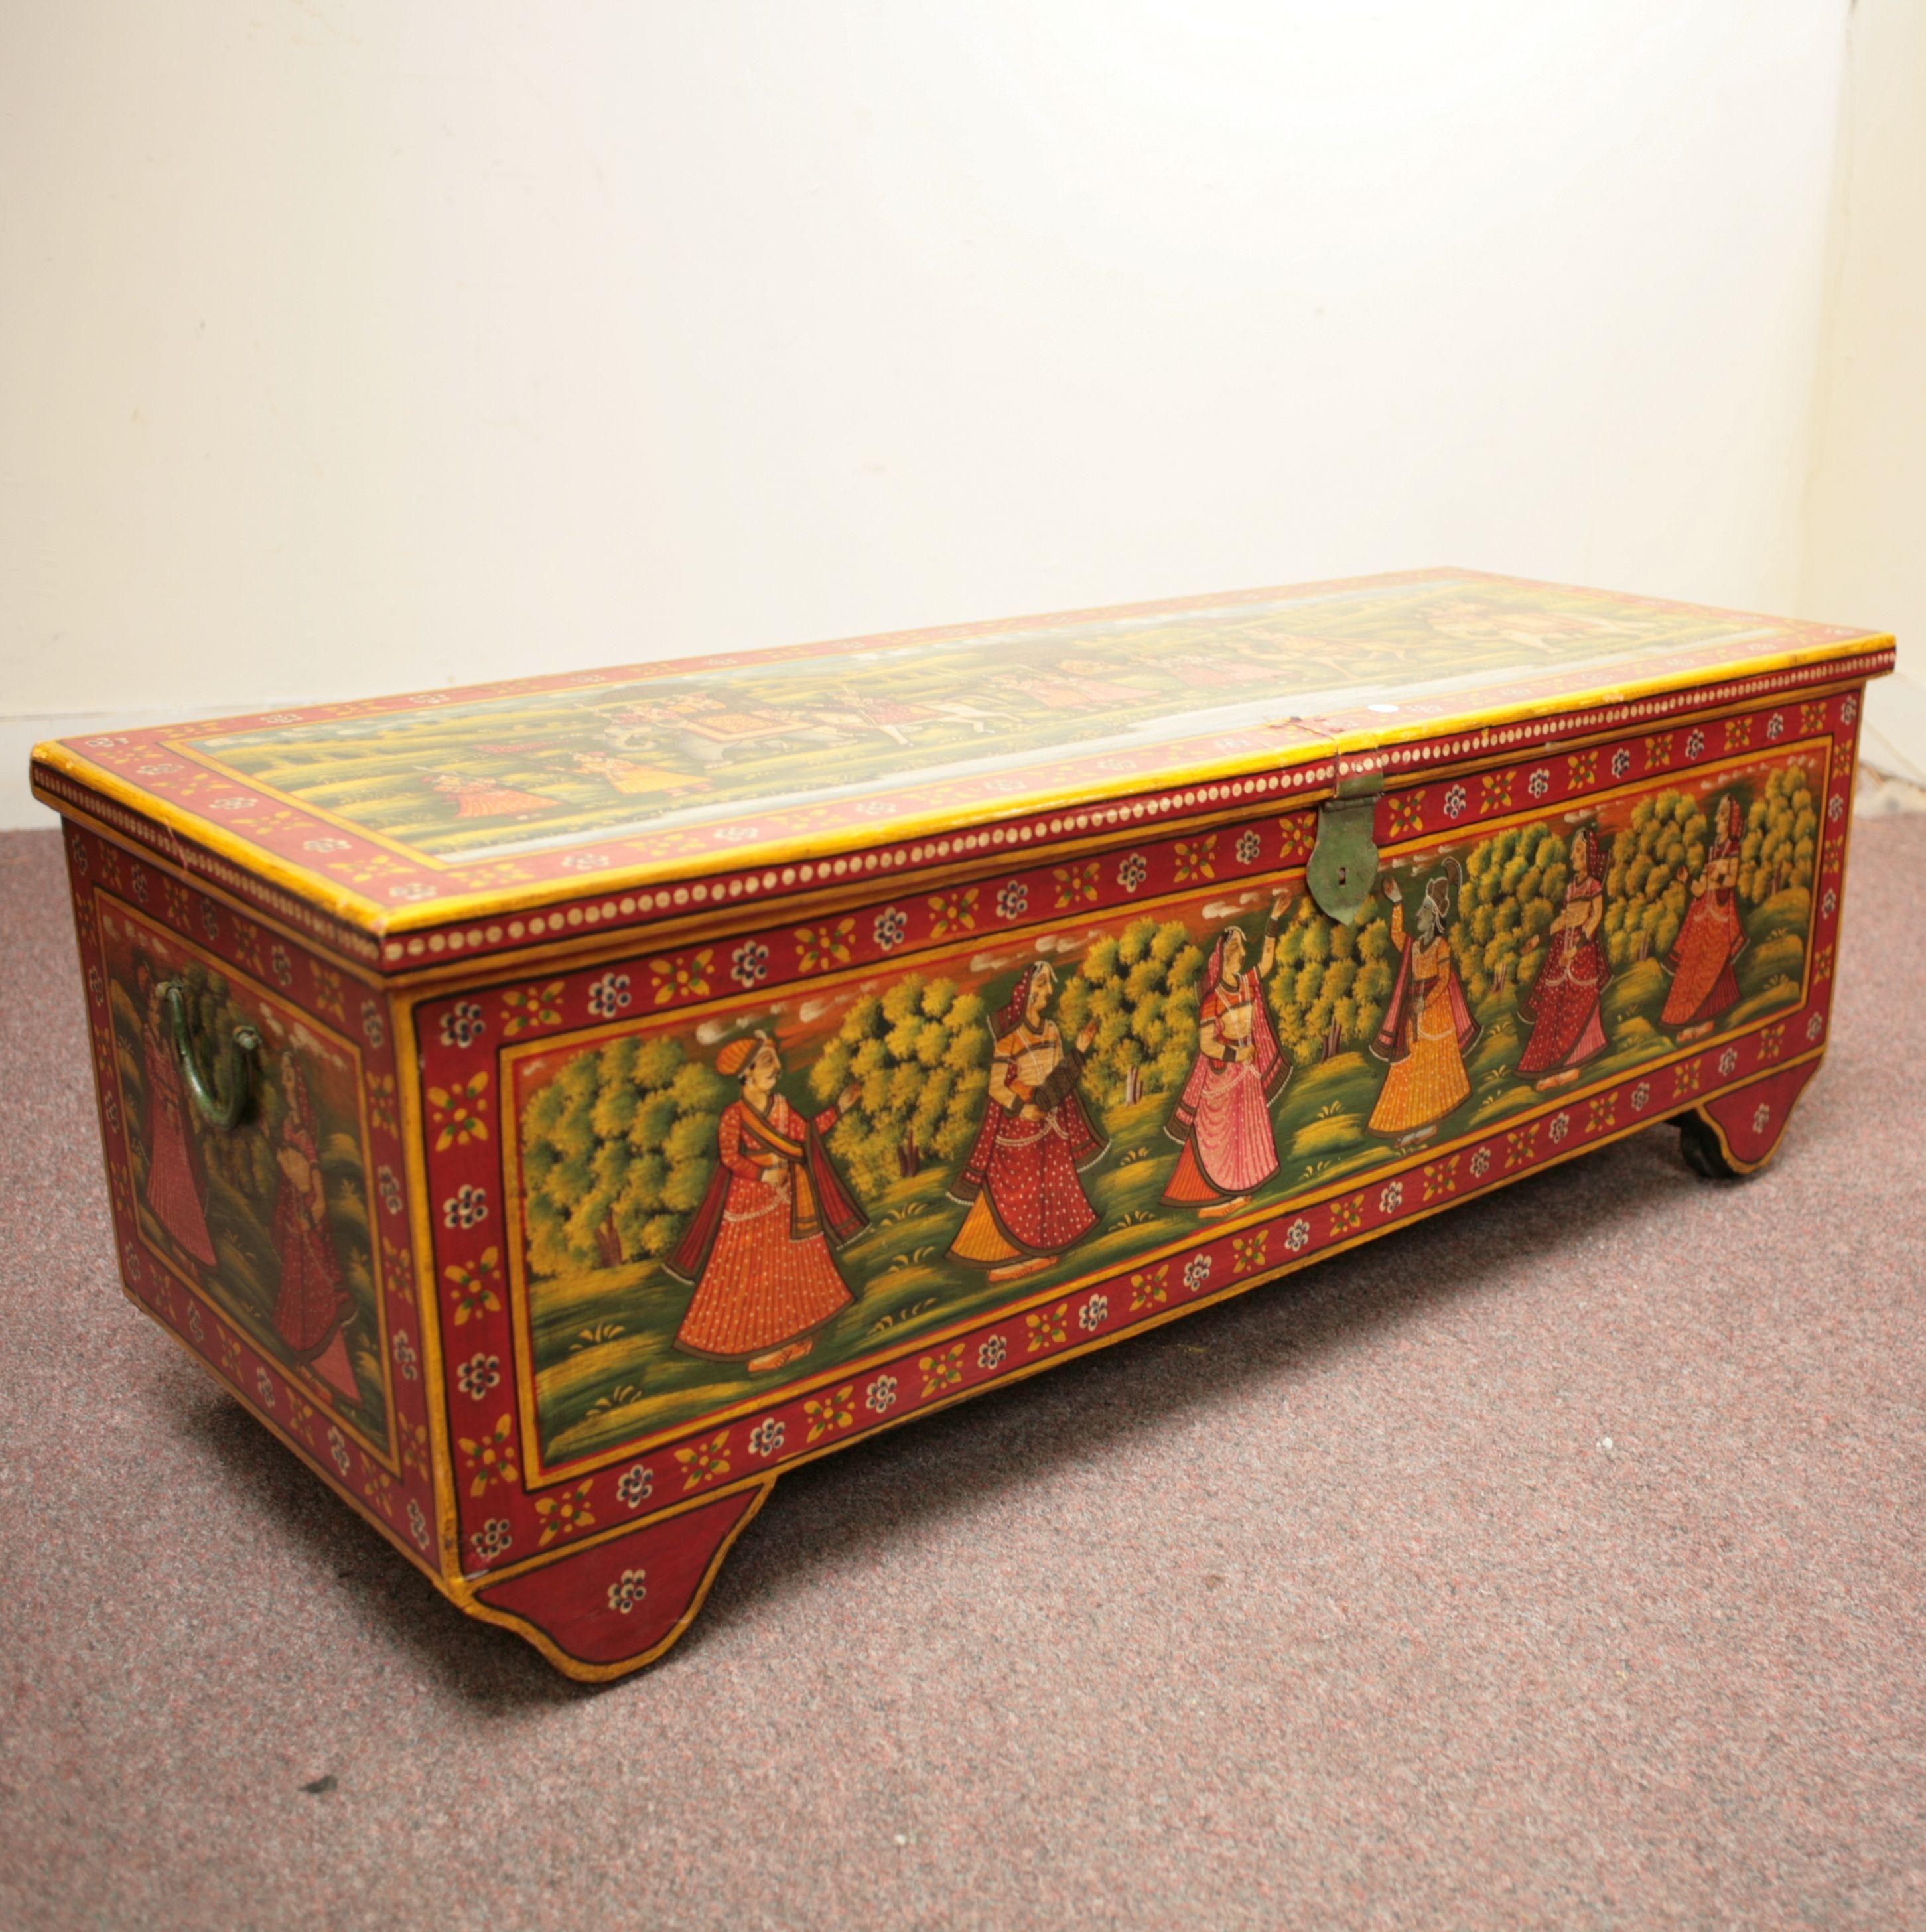 amp home of elegant brighton jugs cupboard furniture hove goods indian